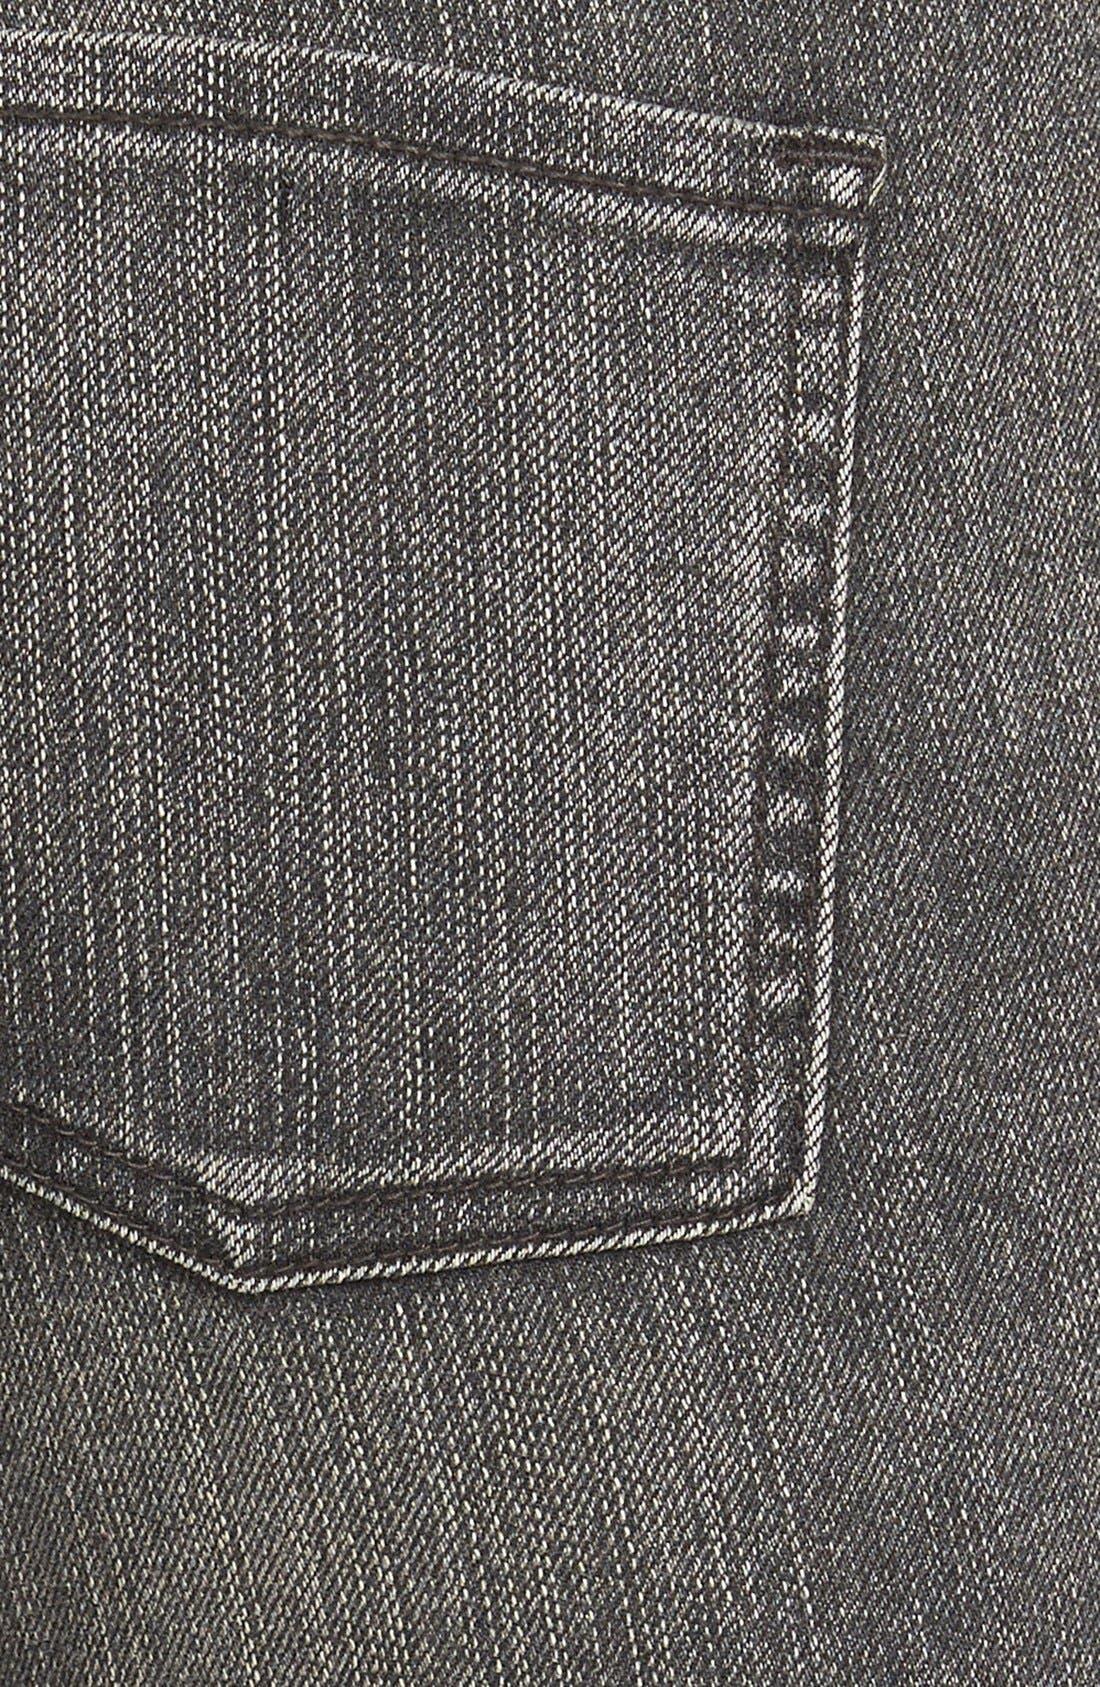 Alternate Image 3  - Volcom Destroyed Cropped Jeans (Gunmetal Grey)